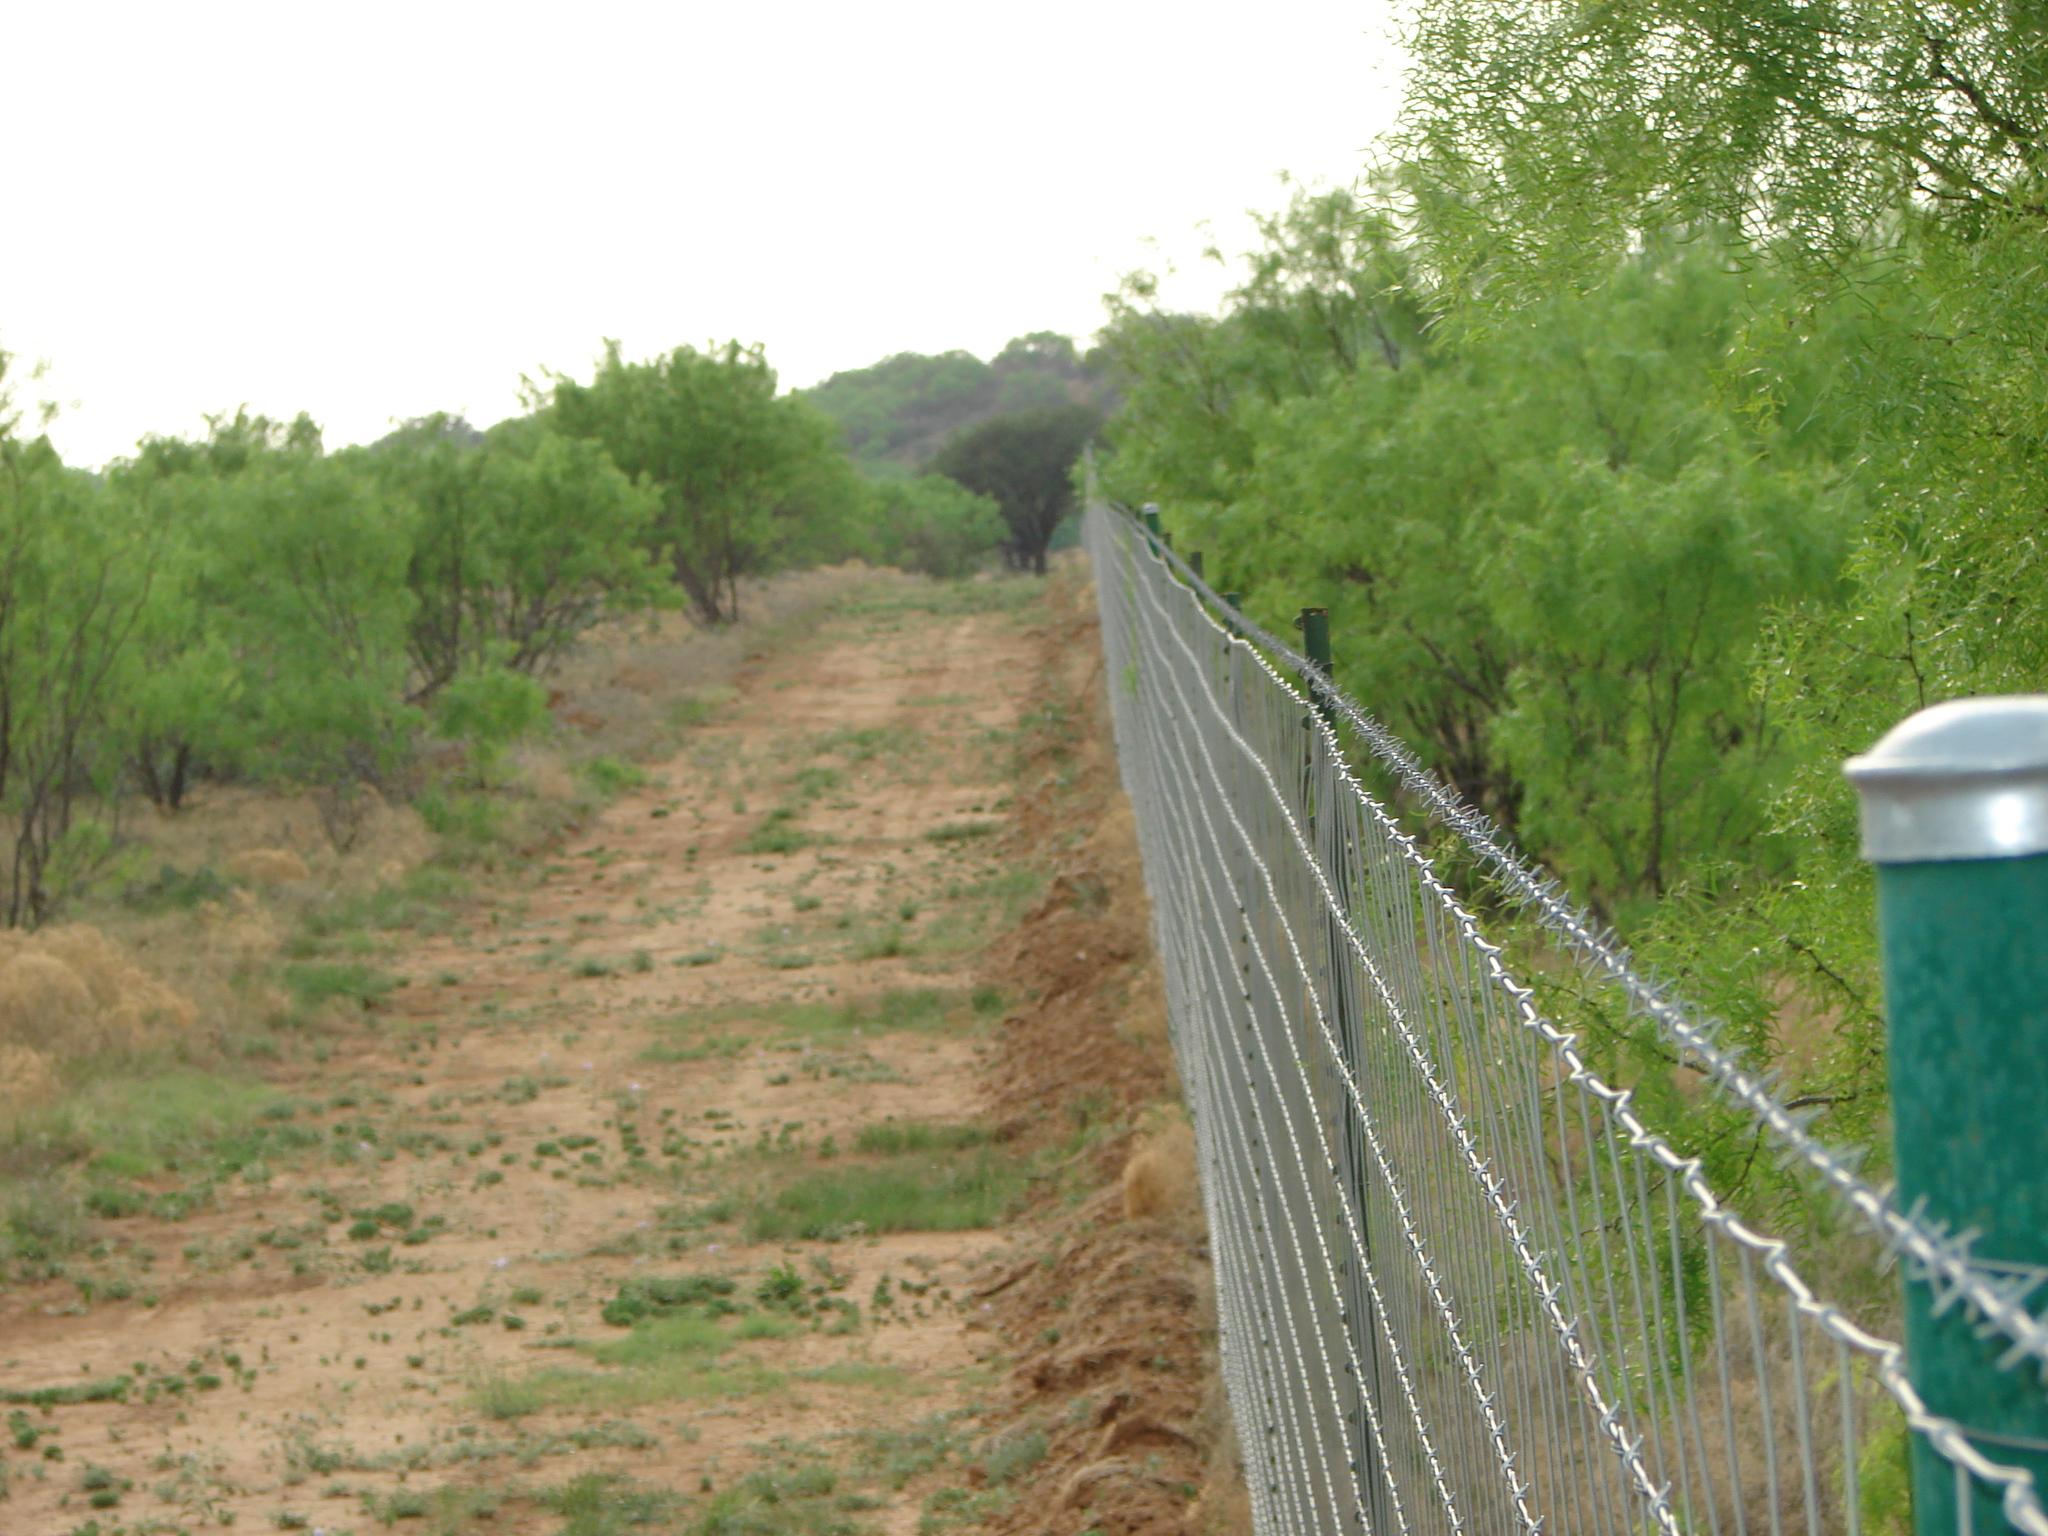 high fencing